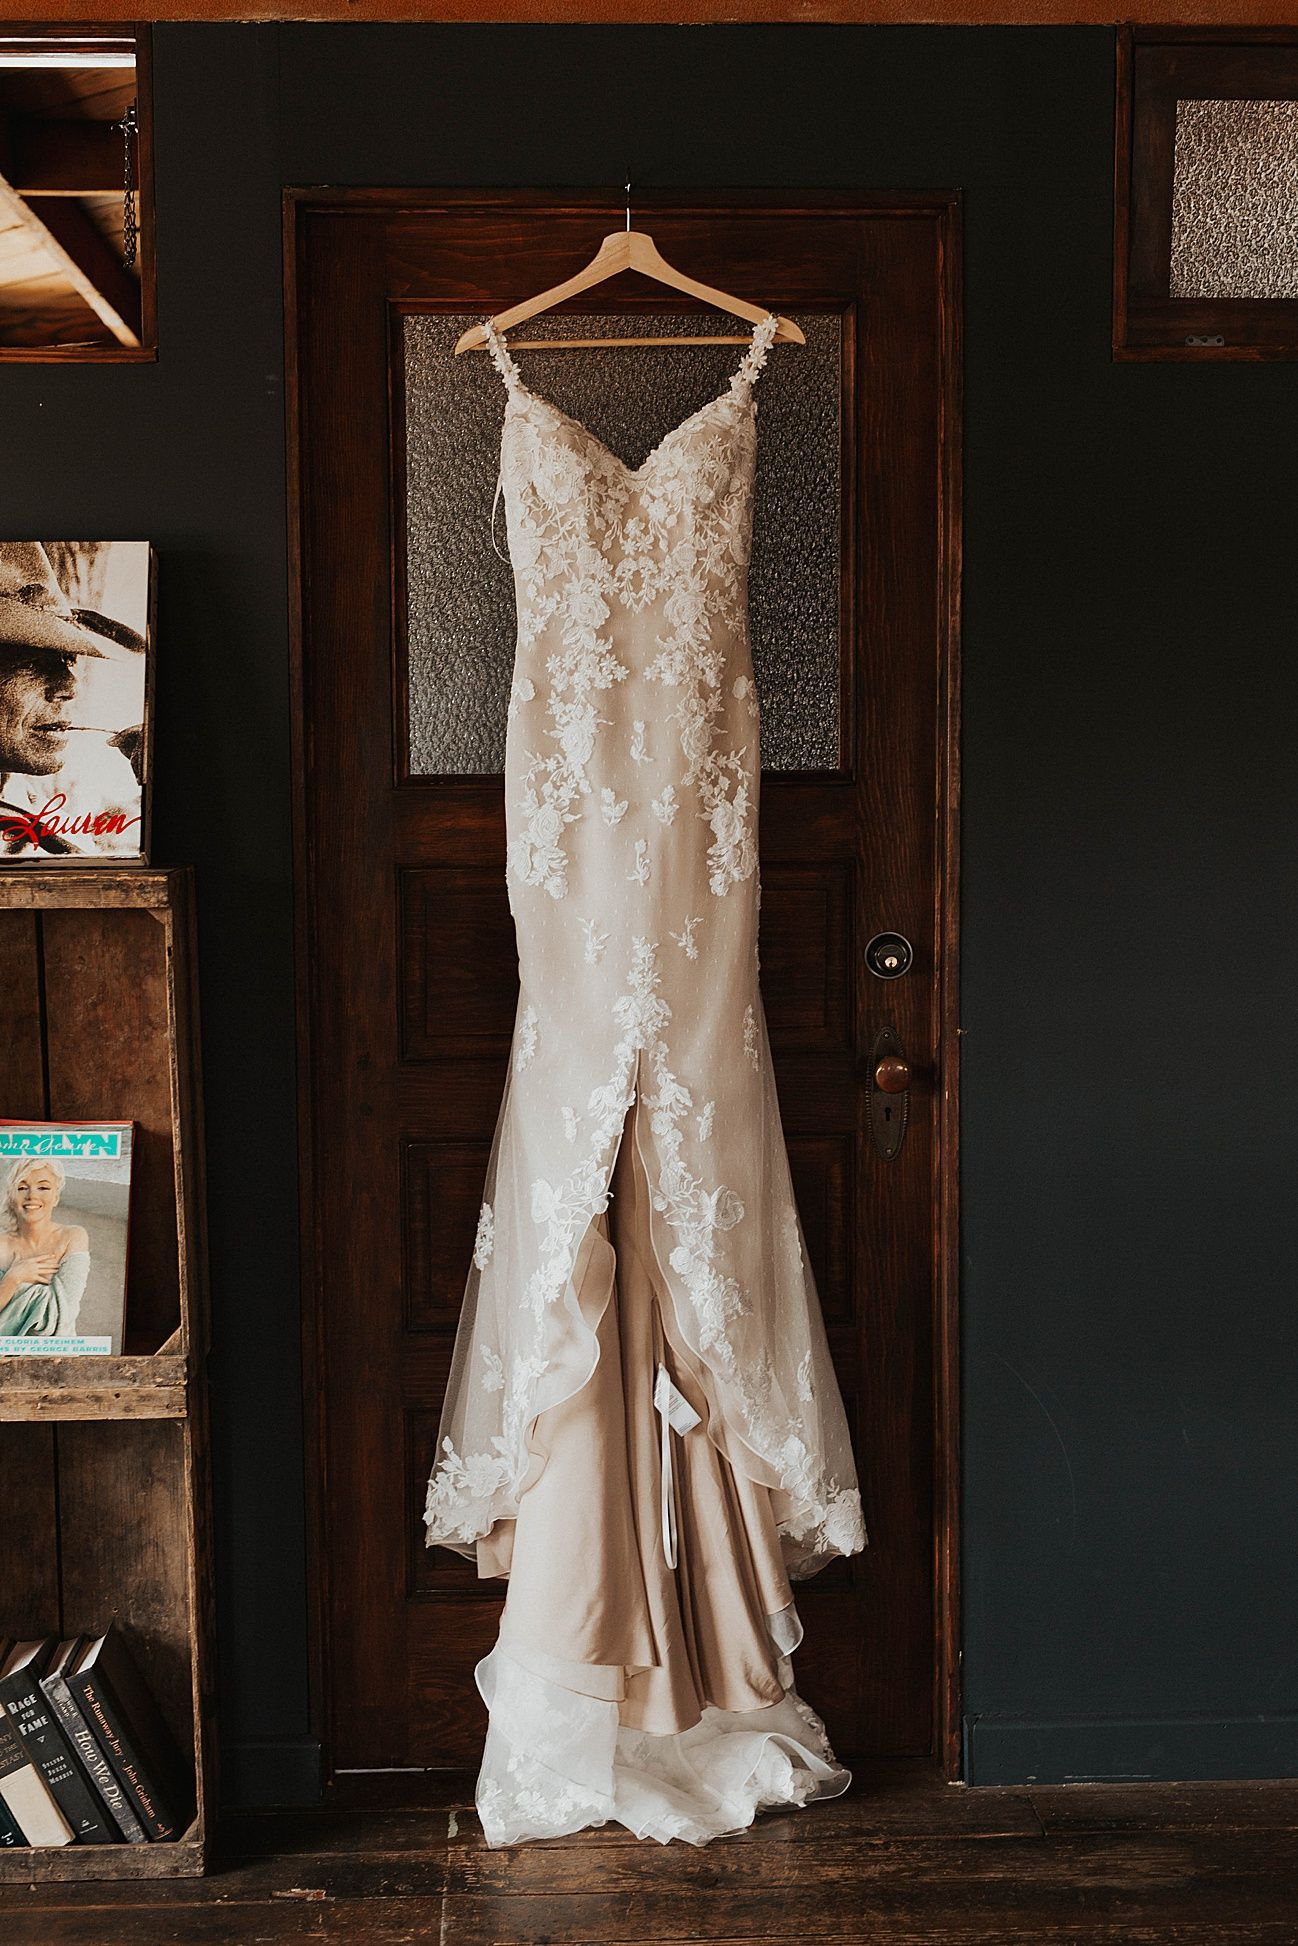 Wedding Dress Bhldn Dress Boho Wedding Dress Smoky Hollow Studio Wedding Los Angele Wedding Dresses Los Angeles Wedding Dress Store Wedding Dresses Unique